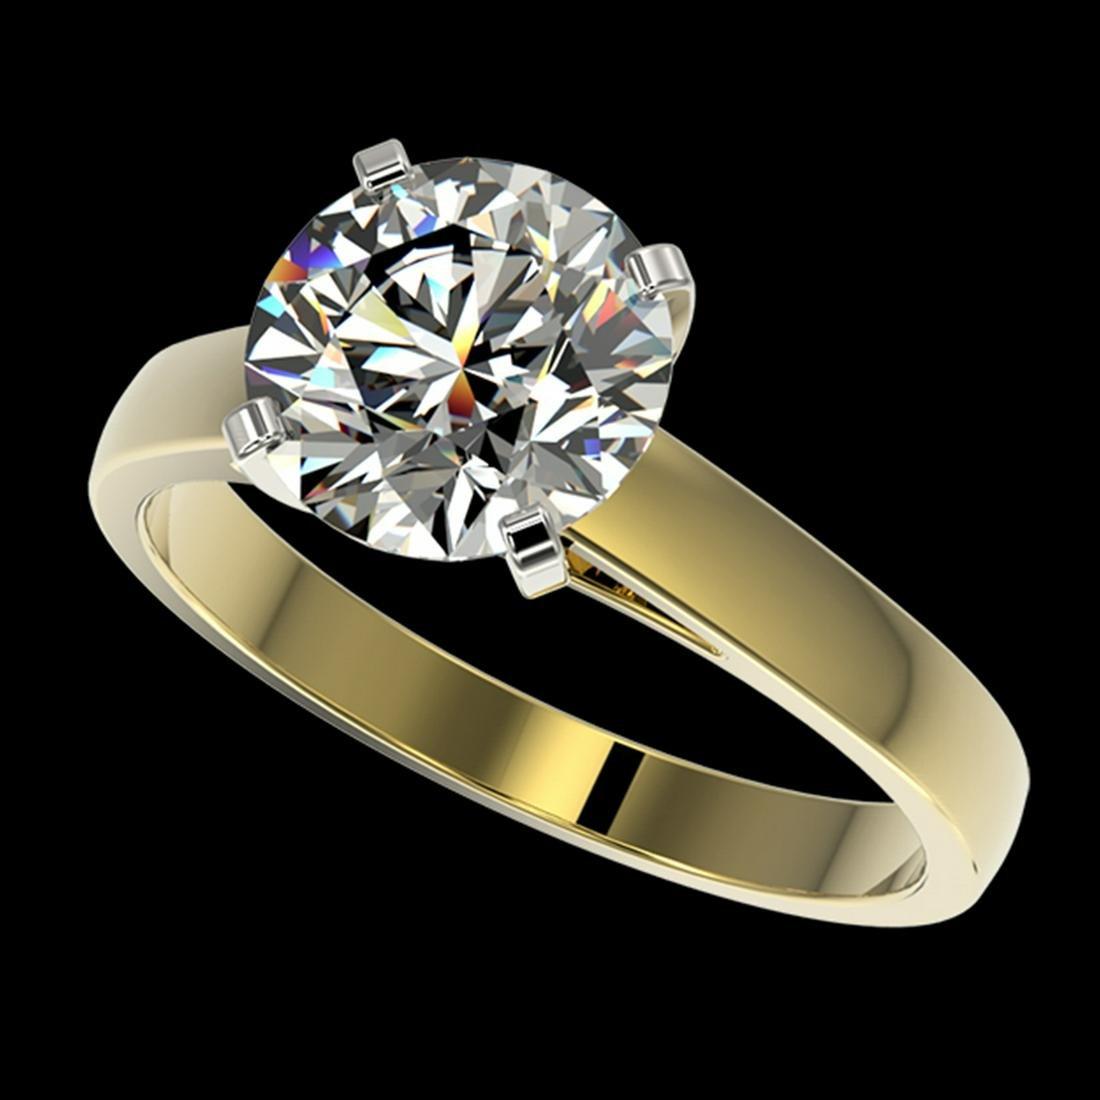 2.55 ctw H-SI/I Diamond Ring 10K Yellow Gold -